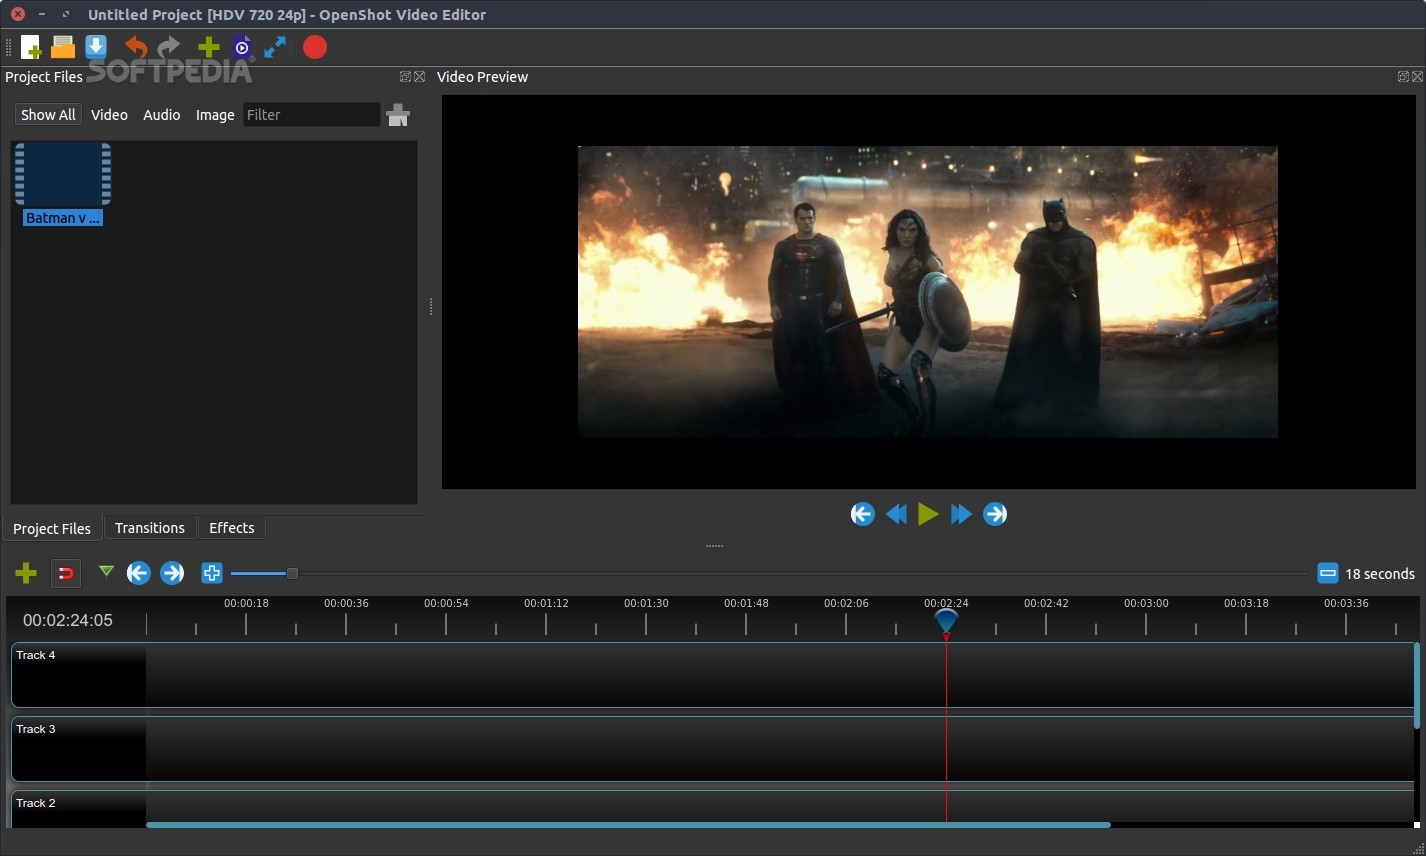 42d7457f4c Openshot Video Editor 2.0.6 Beta 3 Is a Massive Release